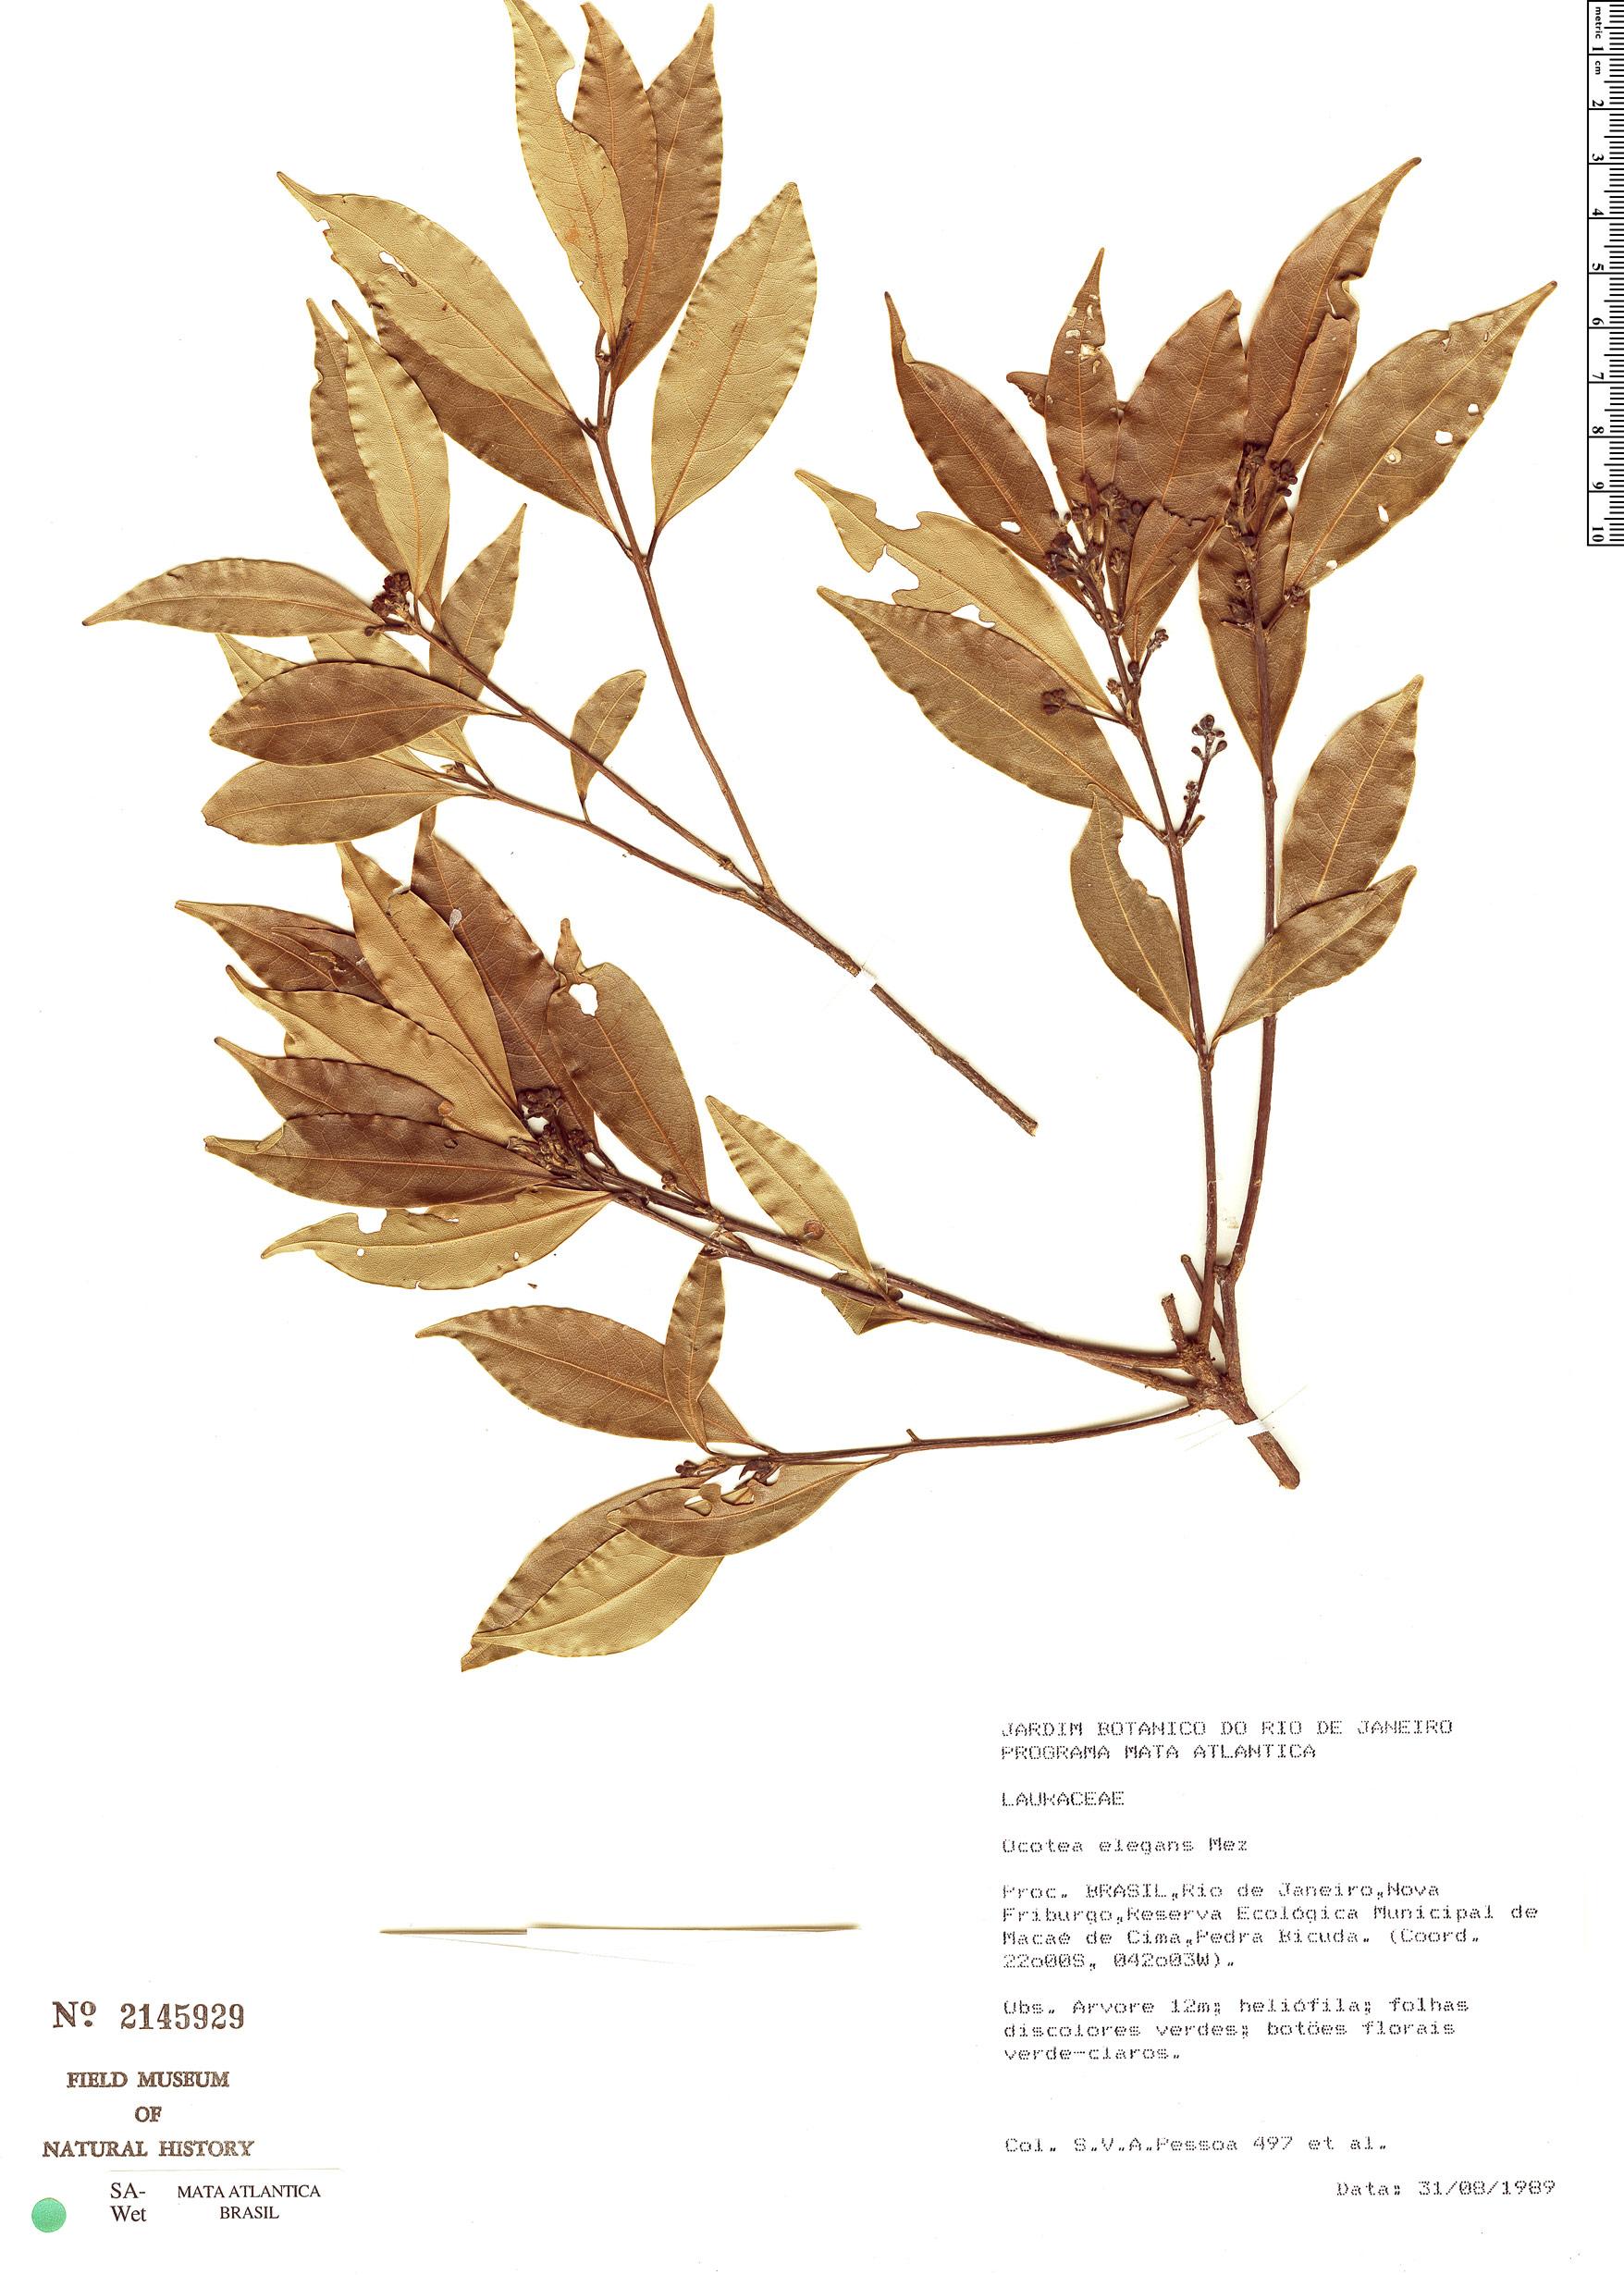 Specimen: Ocotea elegans